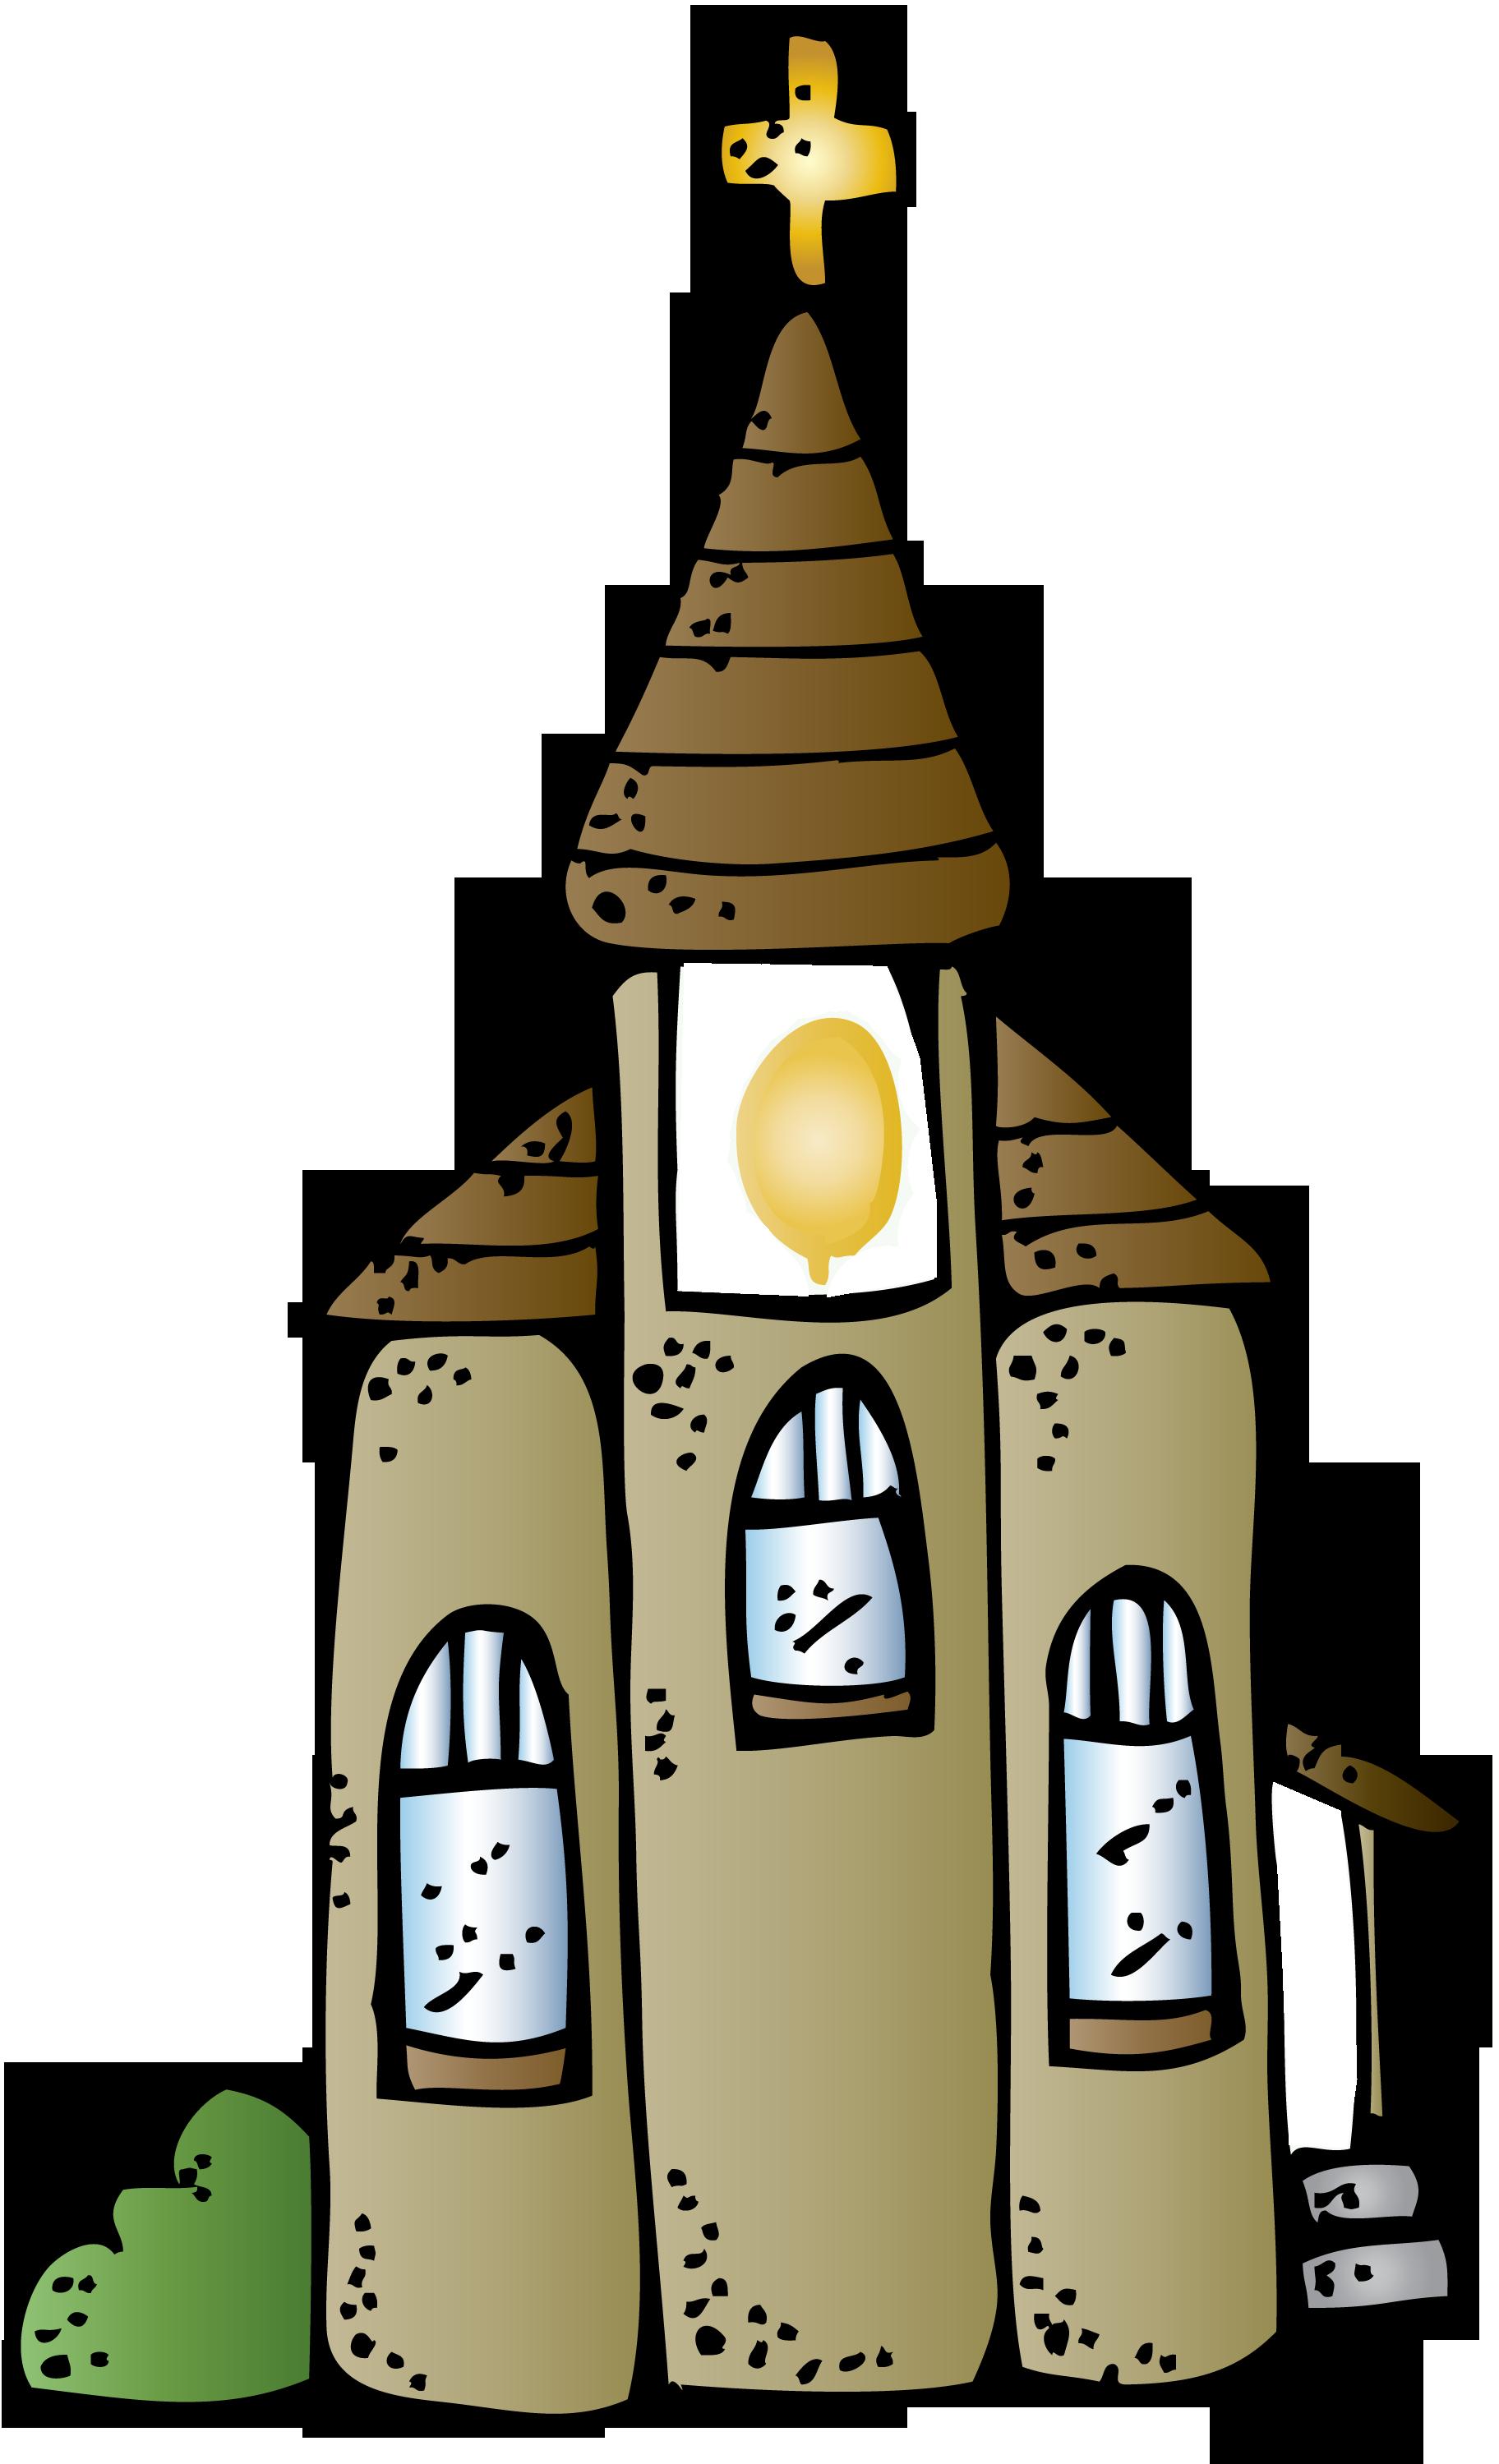 Church Pr C Melonheadz 13 Colored Png 1824 2999 Iglesia Dibujo Imagenes Infantiles Manualidades